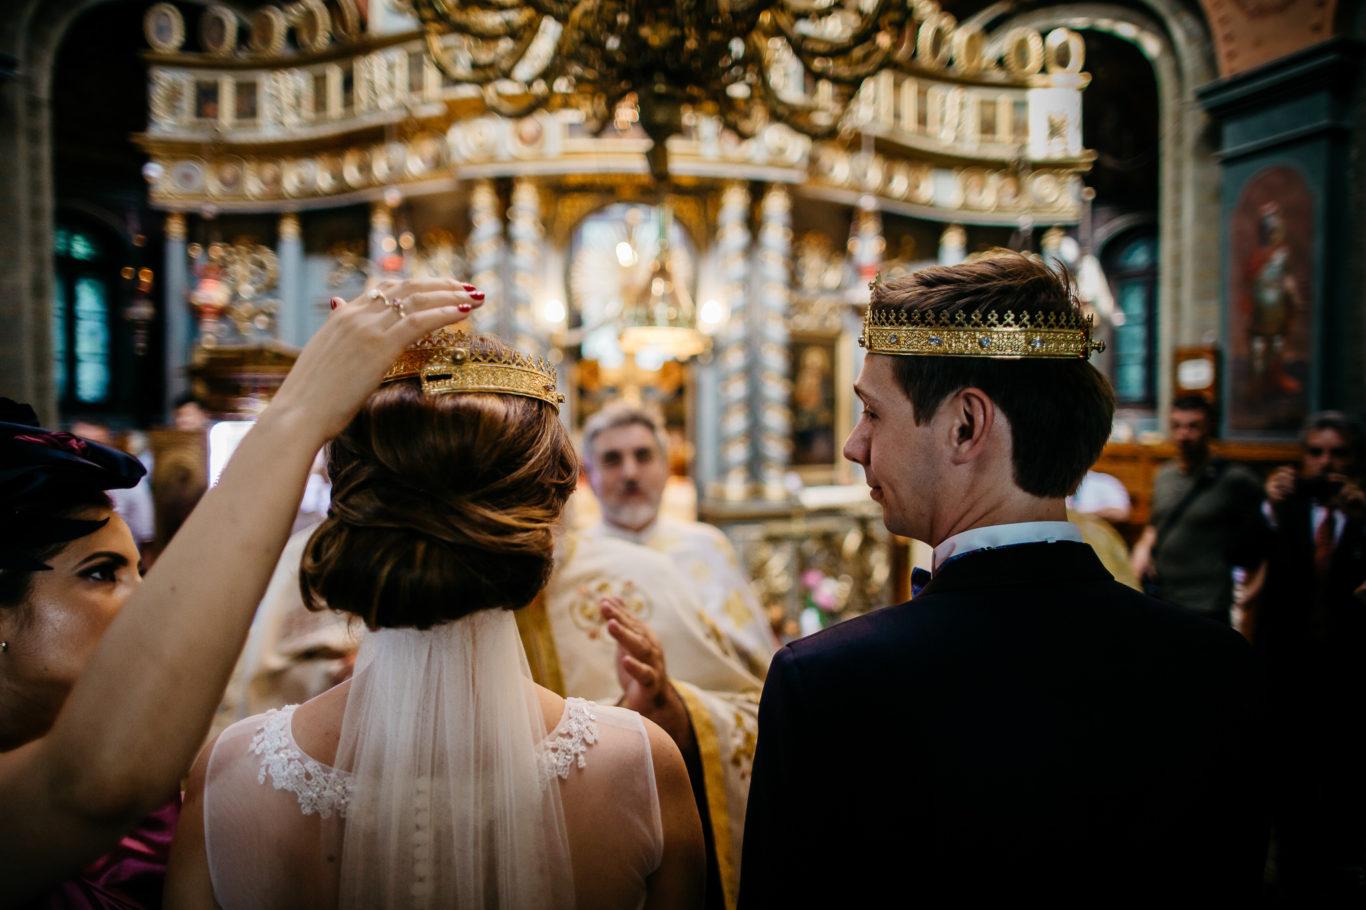 0352-Fotografie-nunta-Bucuresti-Oana-Catalin-fotograf-Ciprian-Dumitrescu-DCF_2067